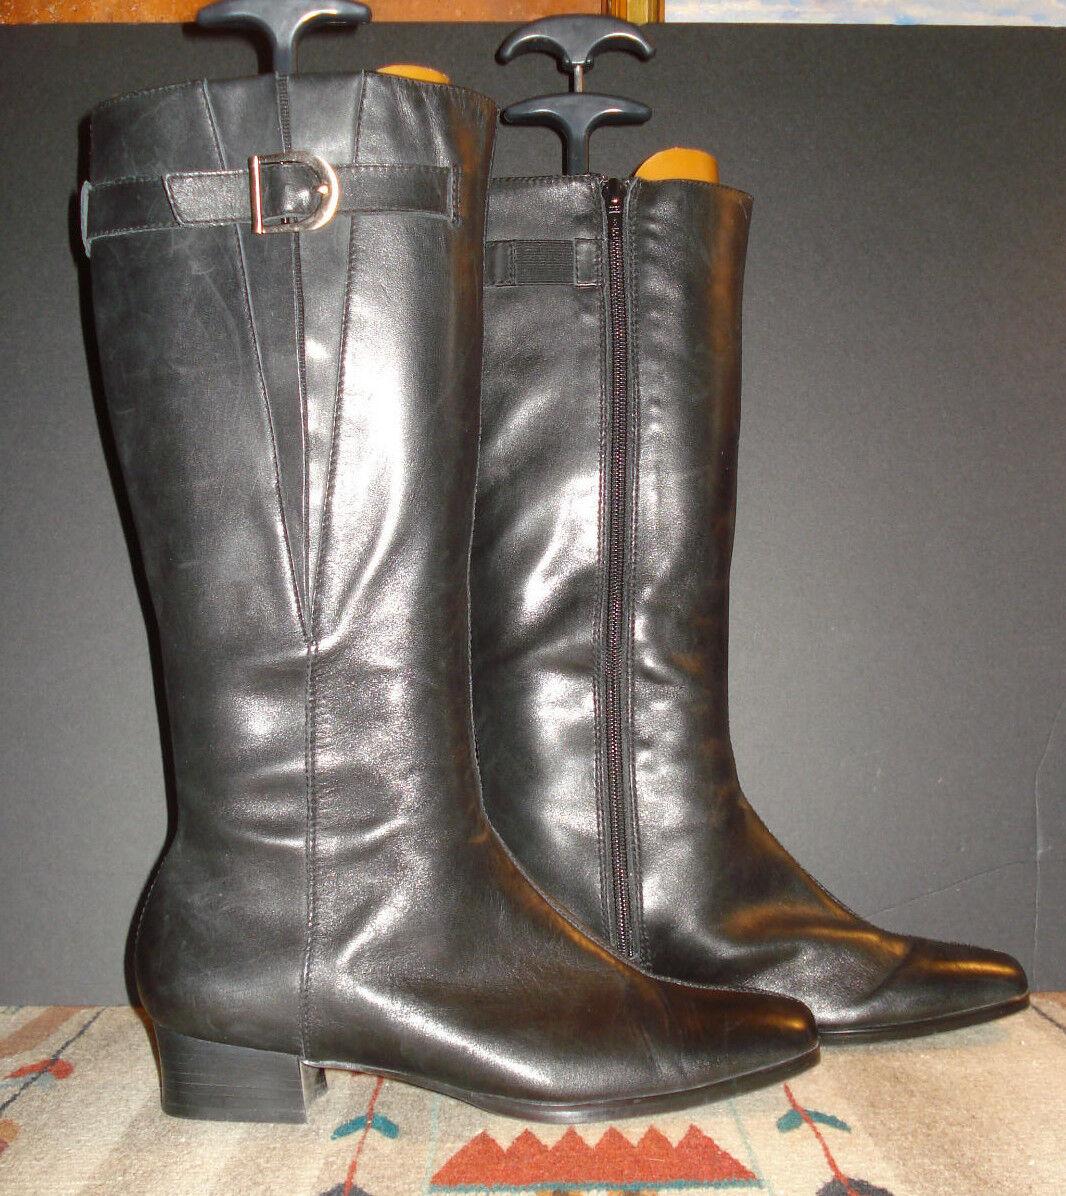 Tredters Black Leather Side Zip Split Toe Field Boot Size 8.5M EXCELLENT